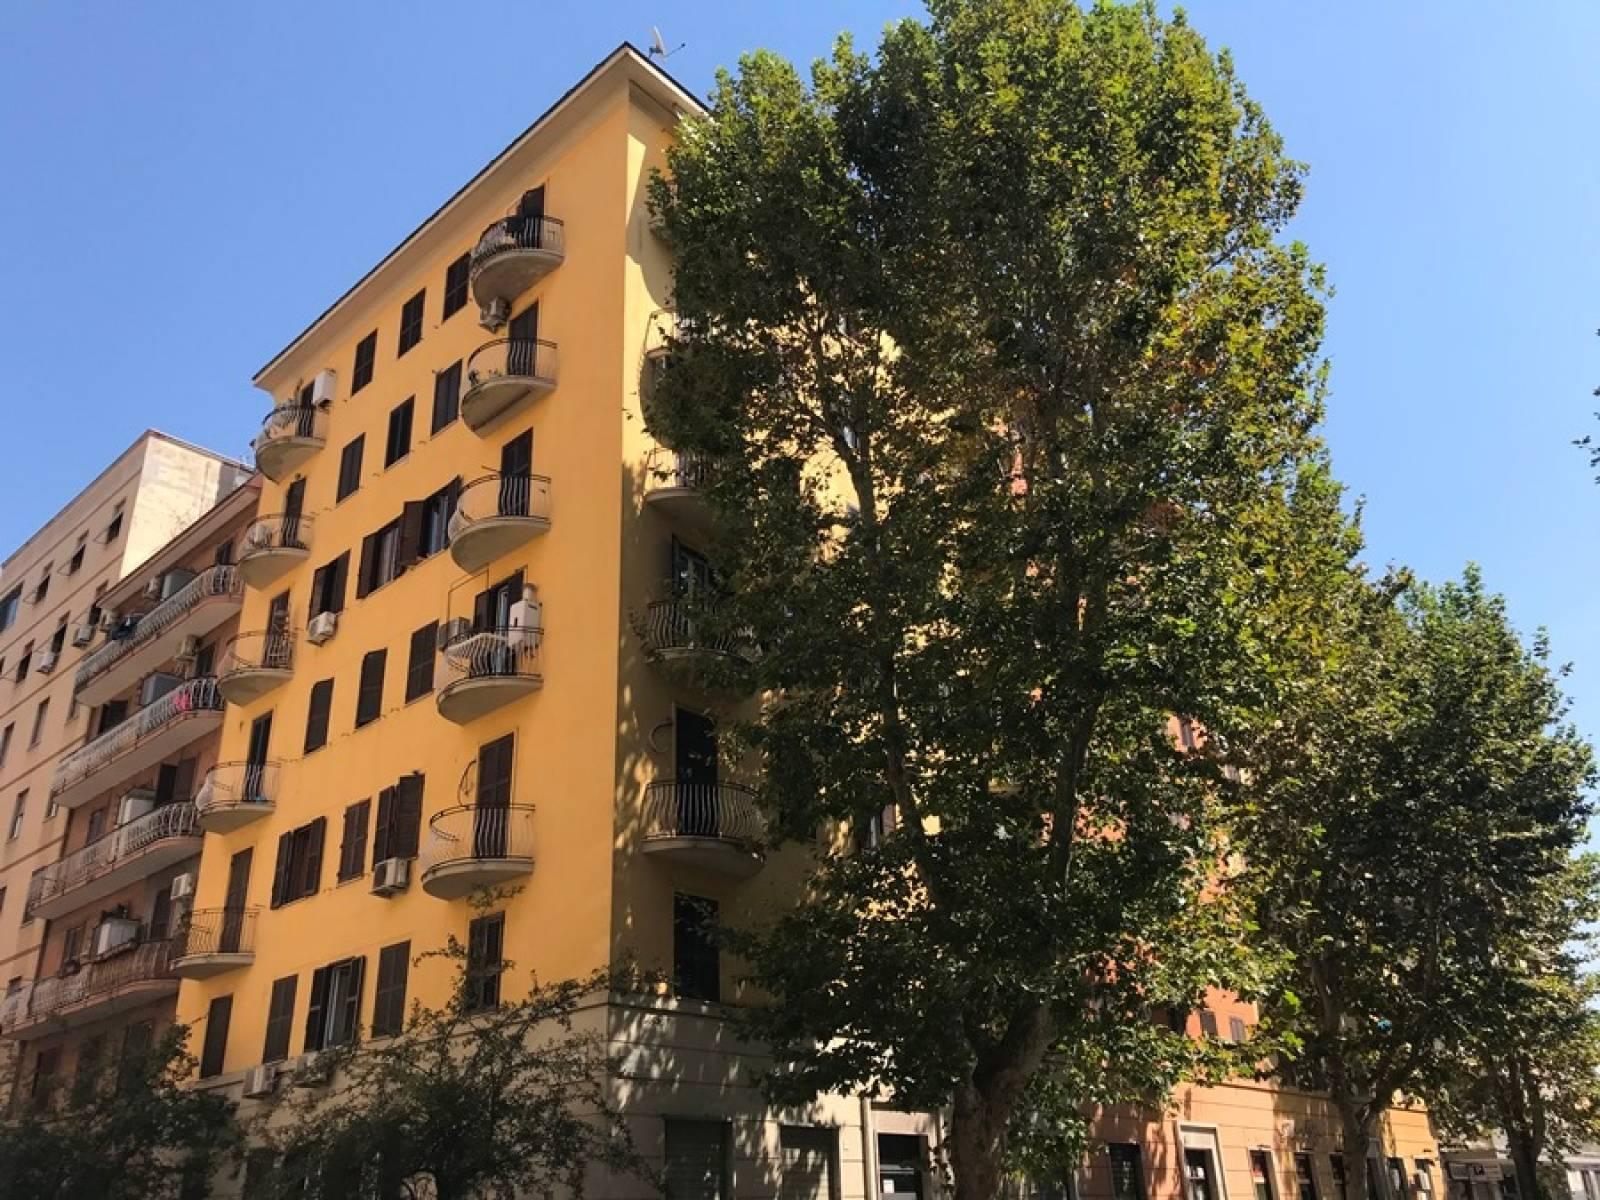 1118417958 Bilocale in Via Antonio Baldissera, Roma, Zona Tiburtina, Casal bruciato